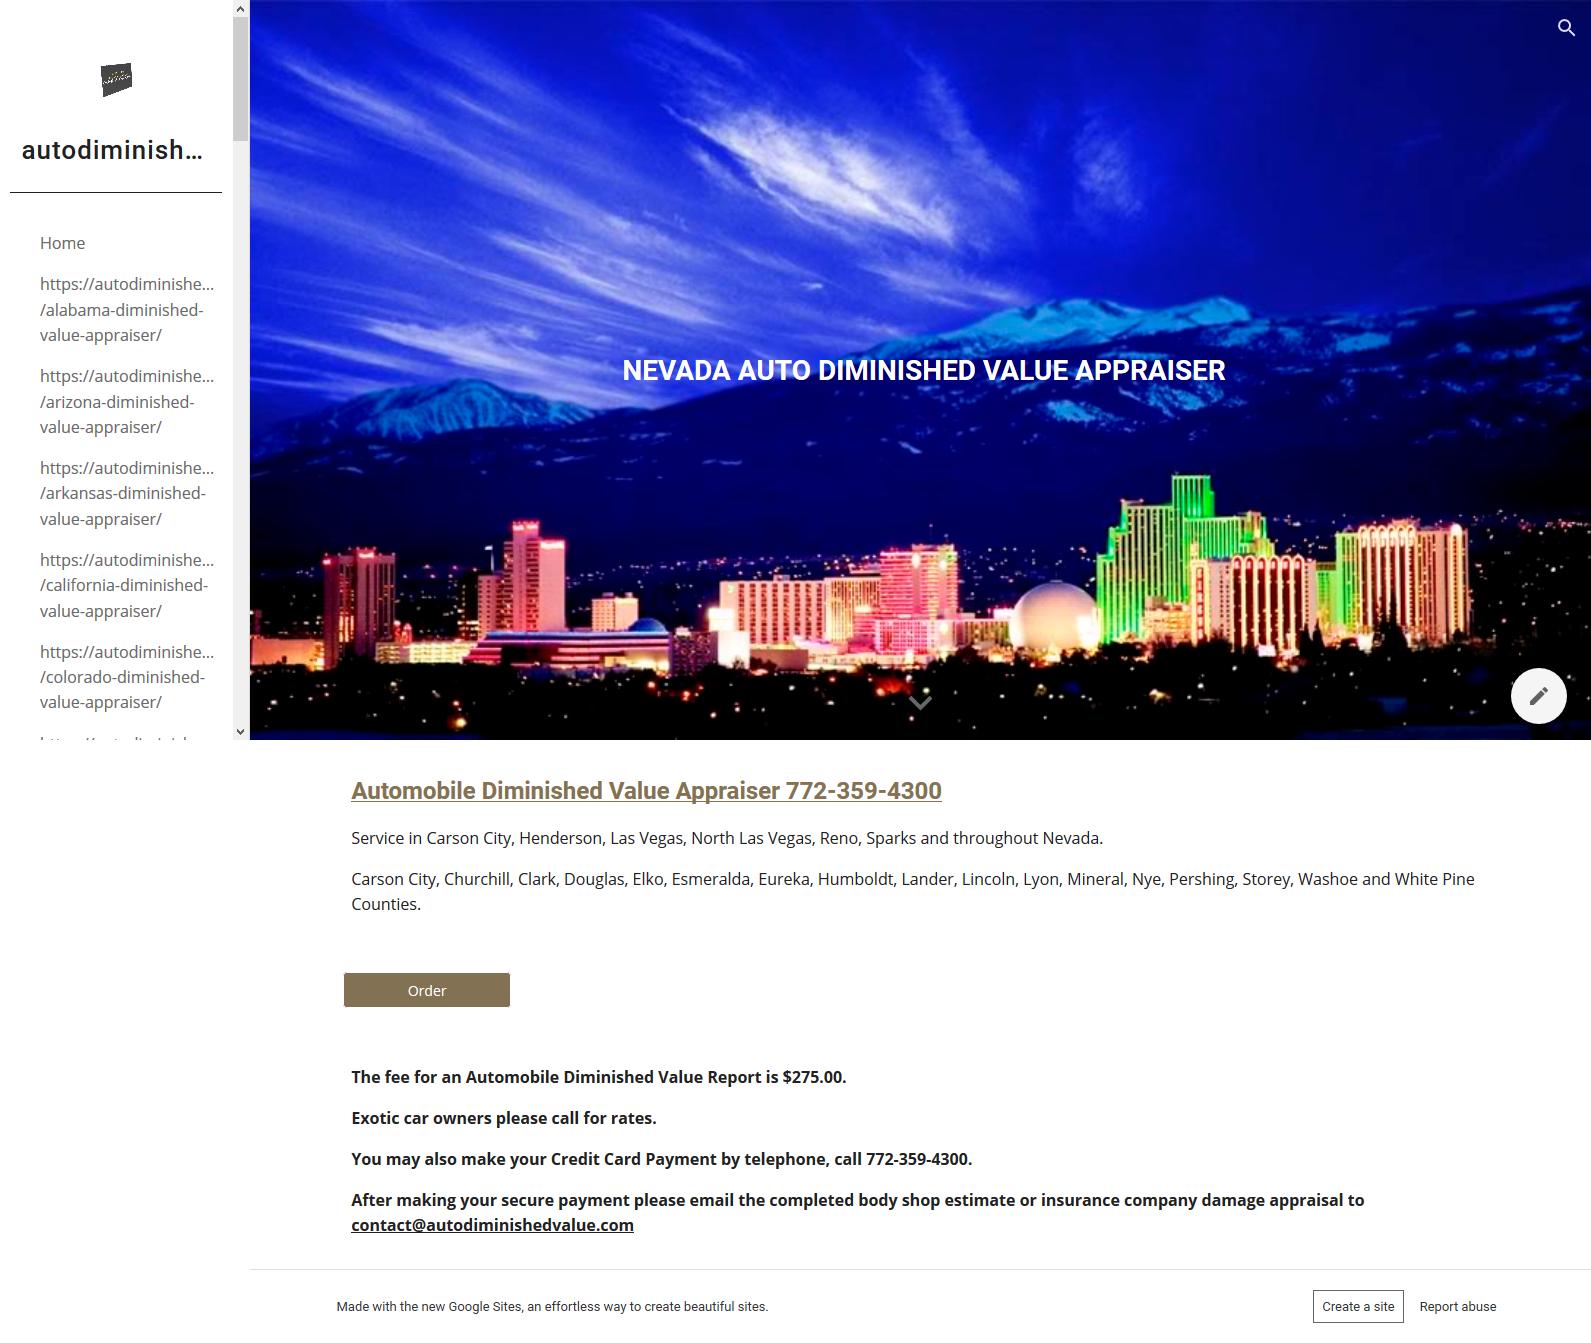 Nevada Auto Diminished Value Appraisal 772-359-4300